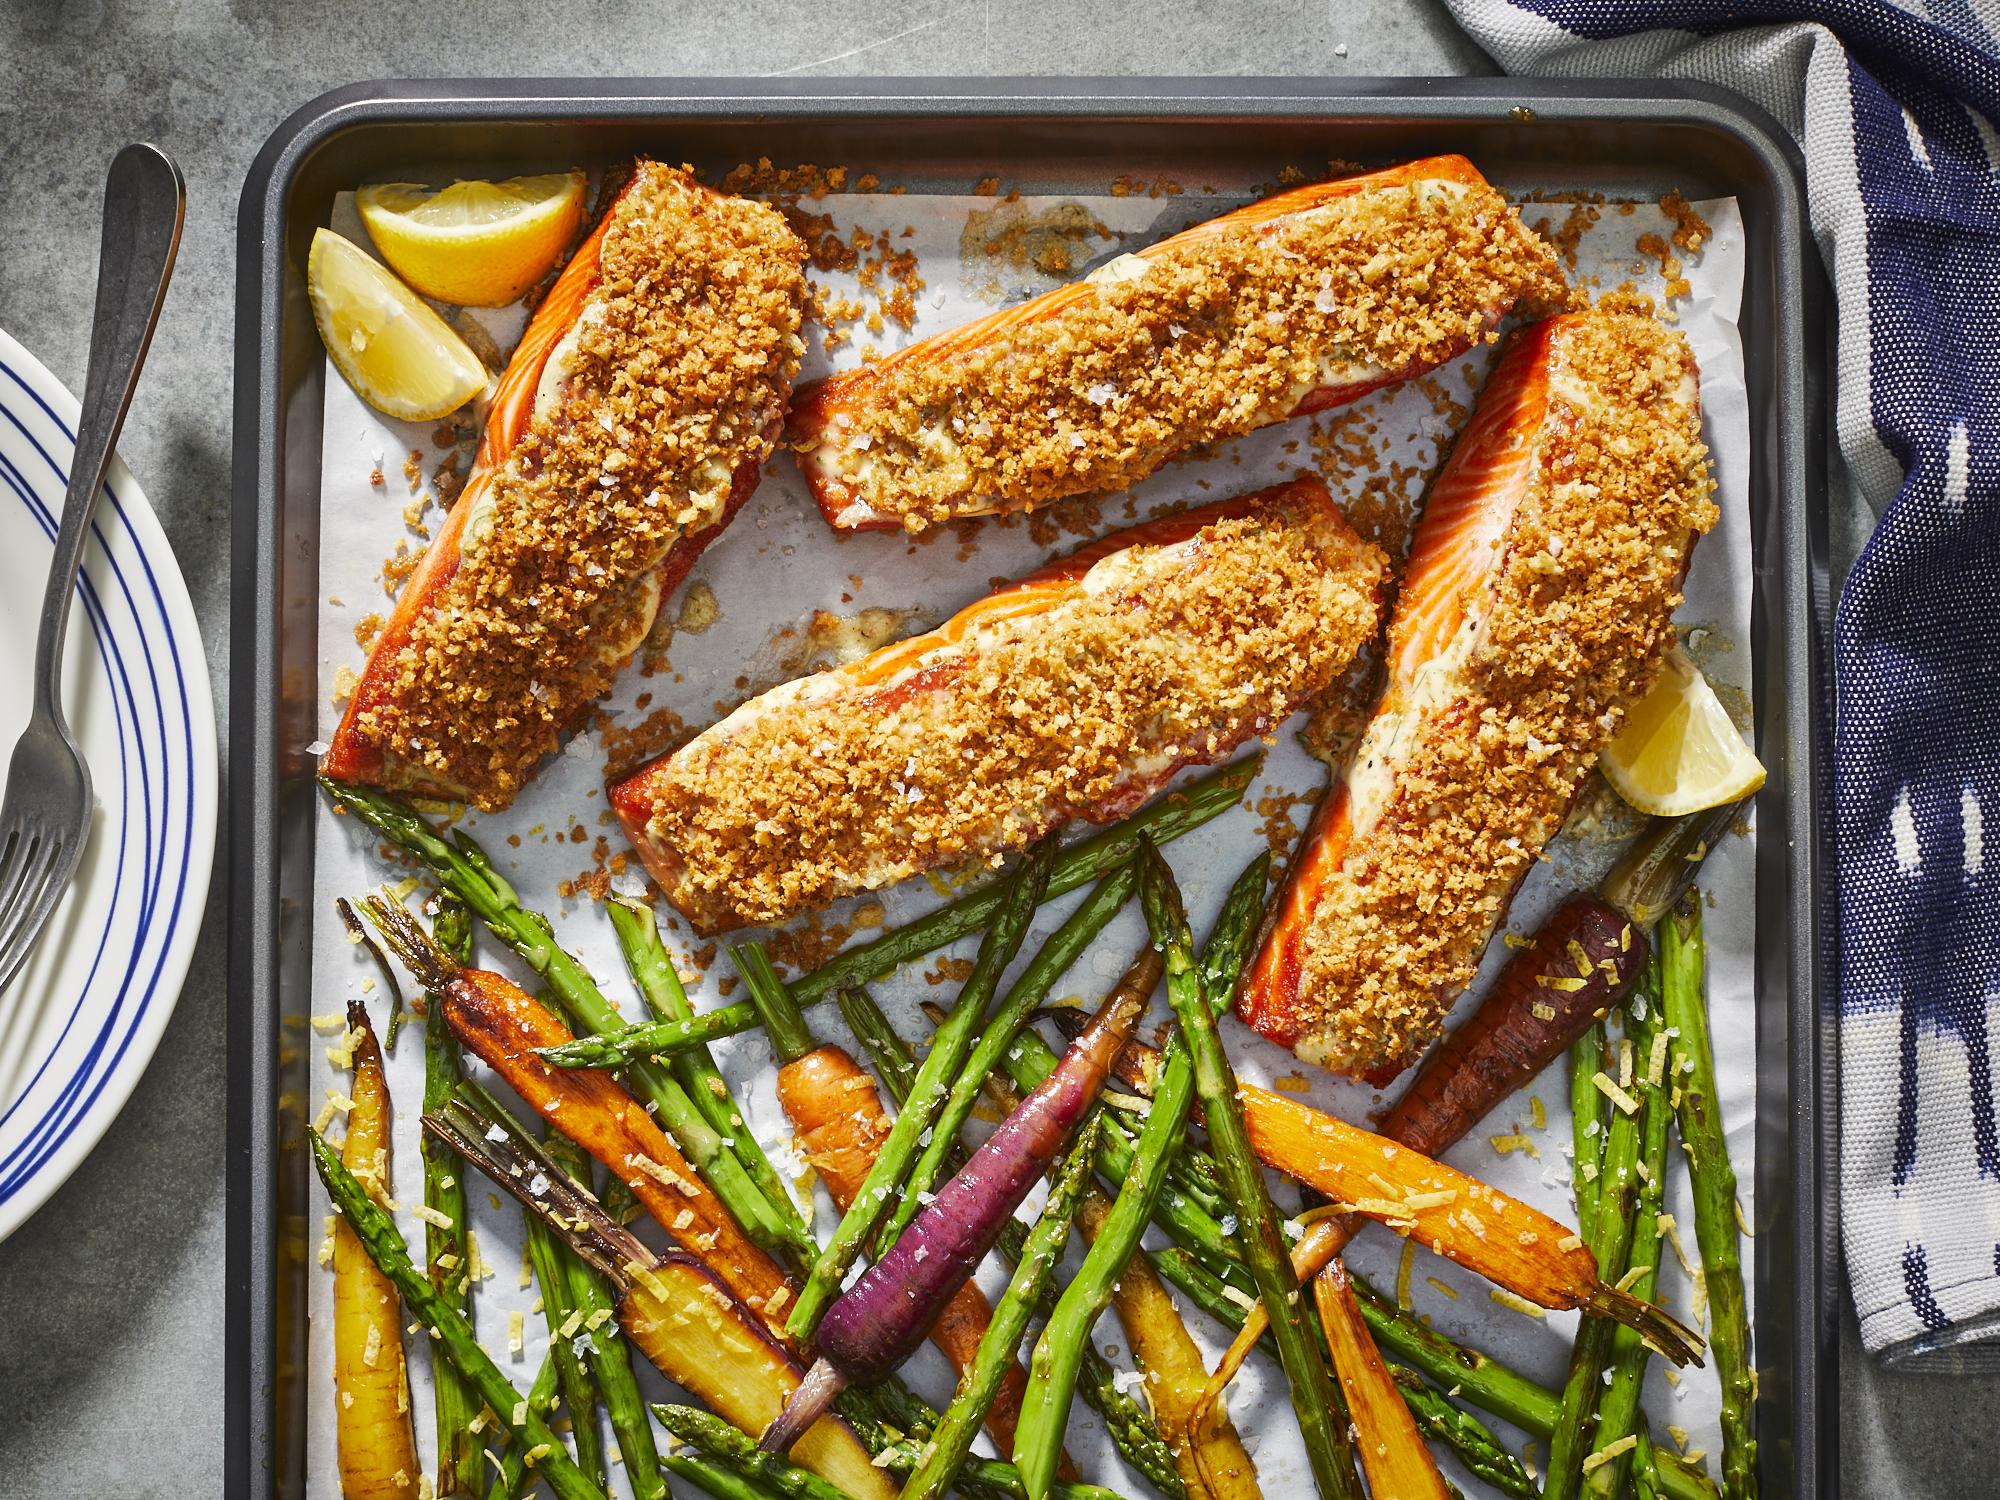 Crispy Sheet Pan Salmon with Lemony Asparagus and Carrots